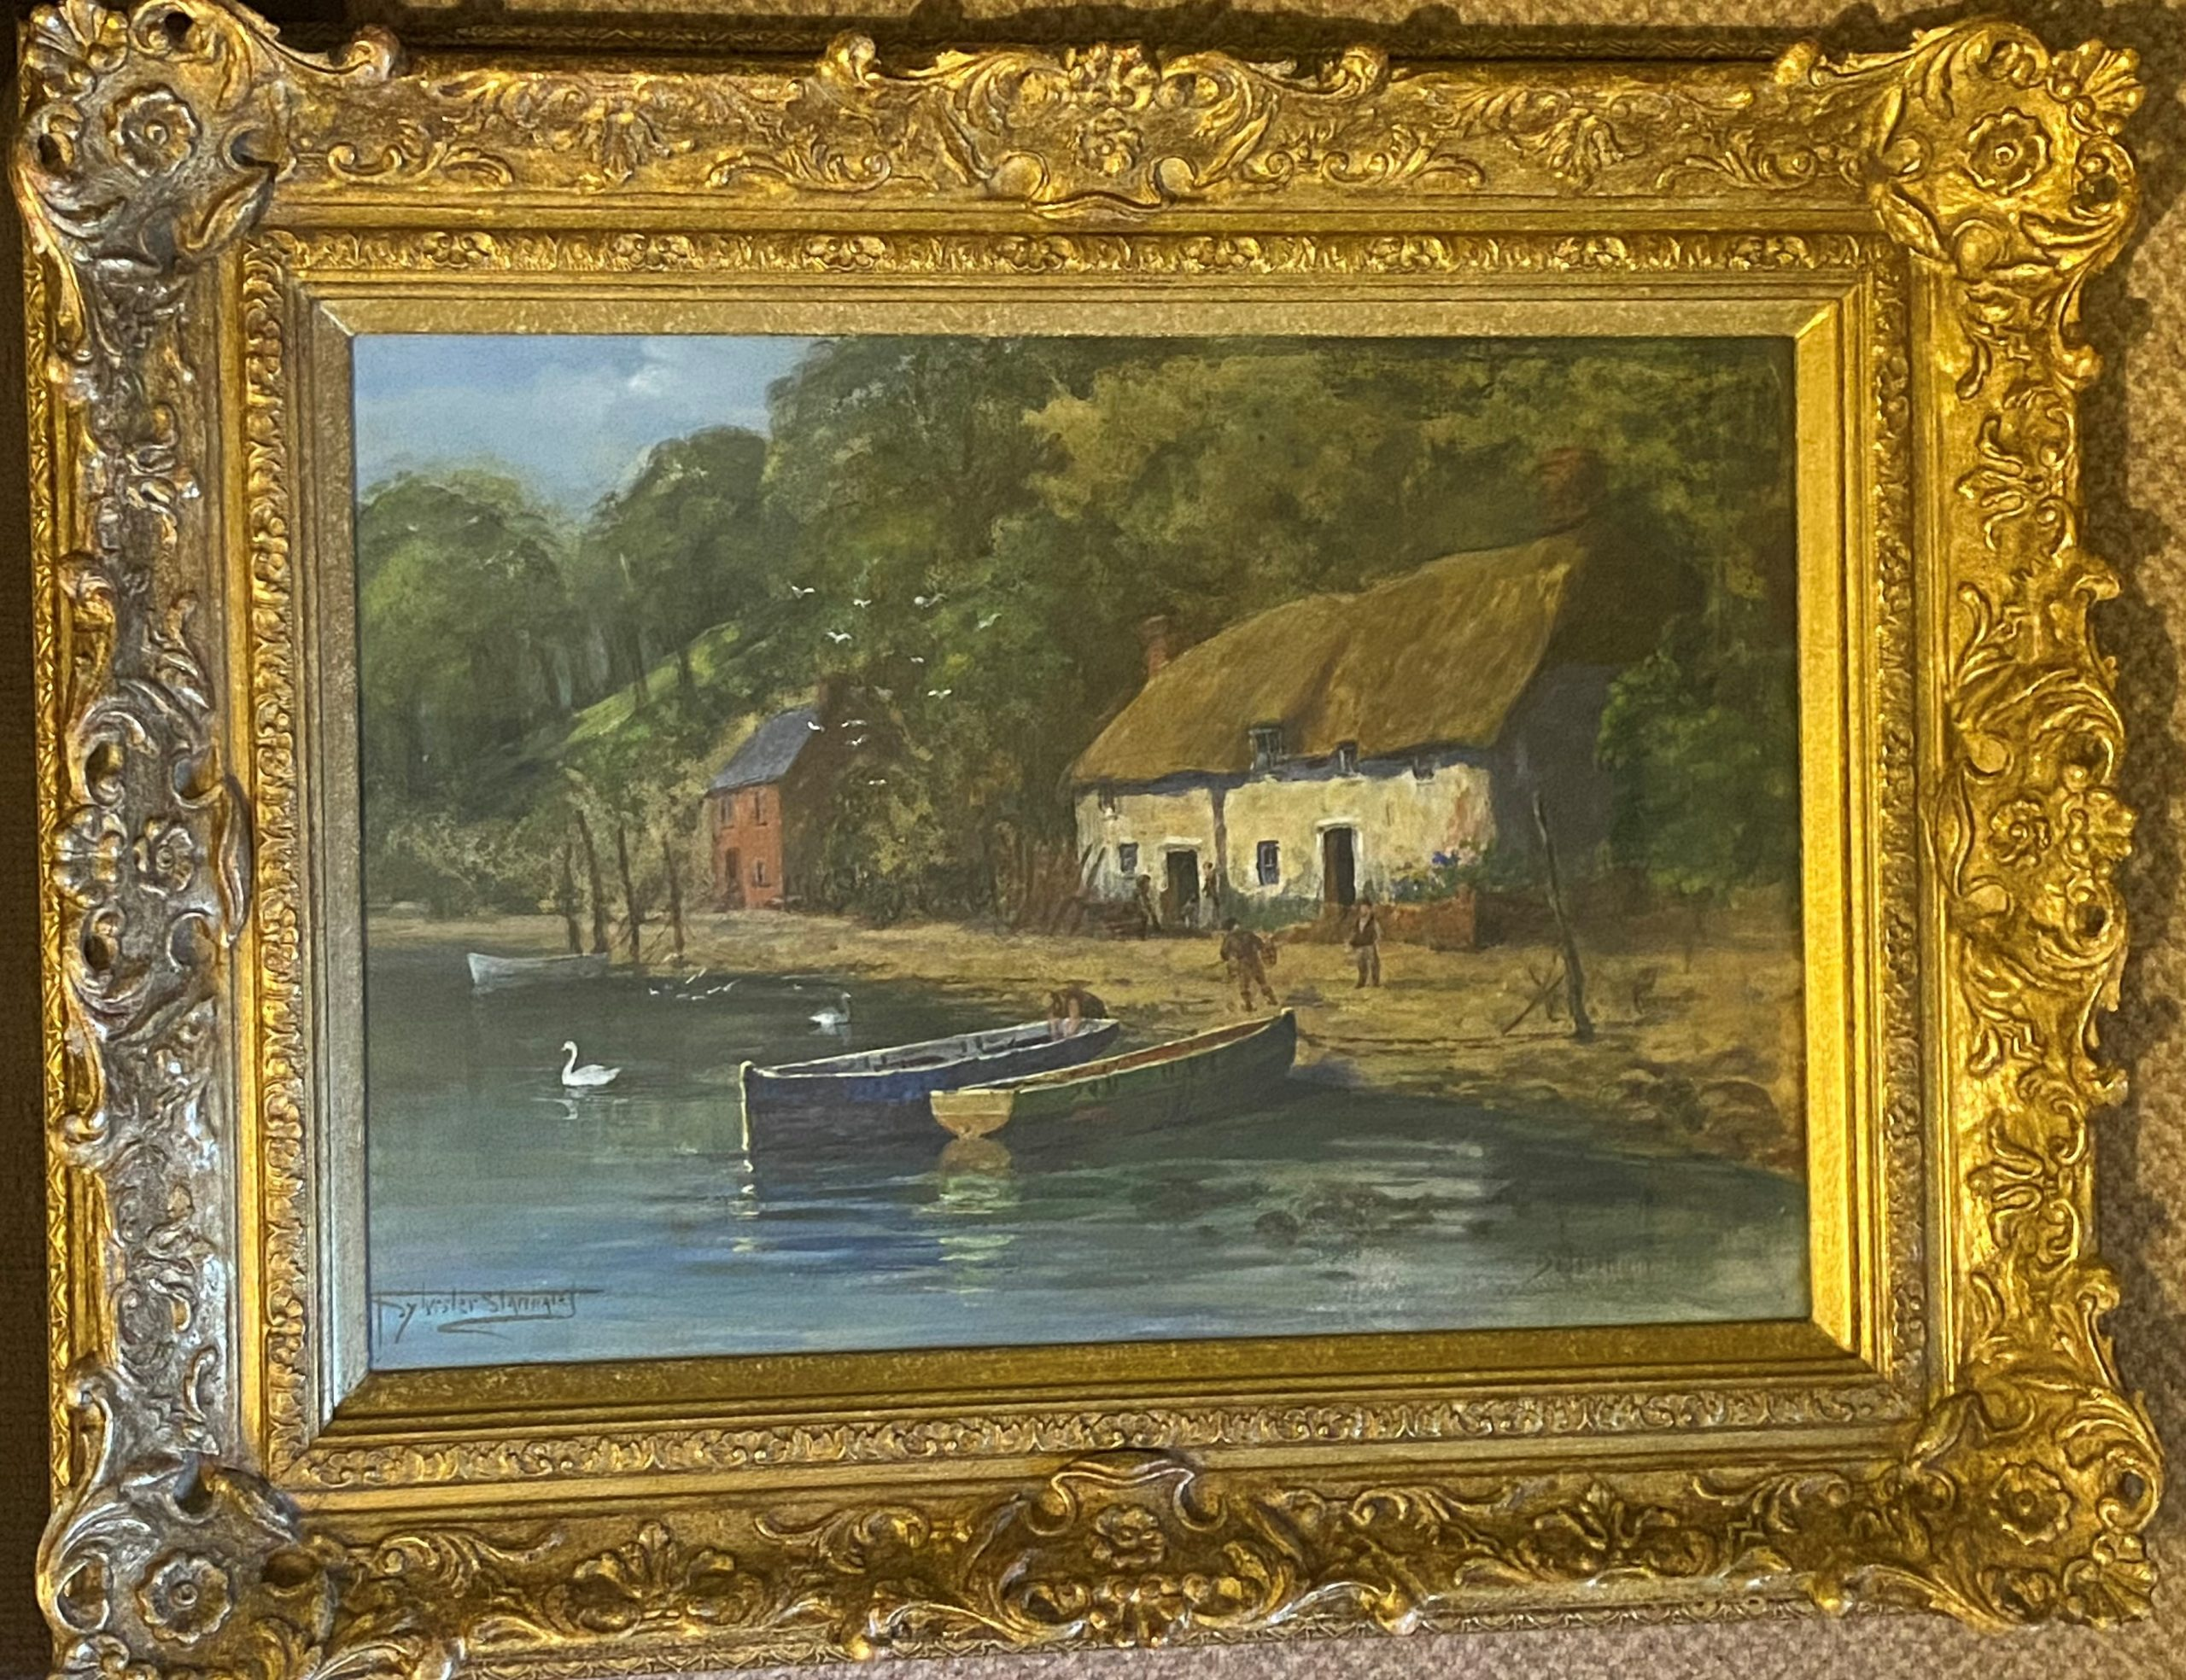 Stannard Boats